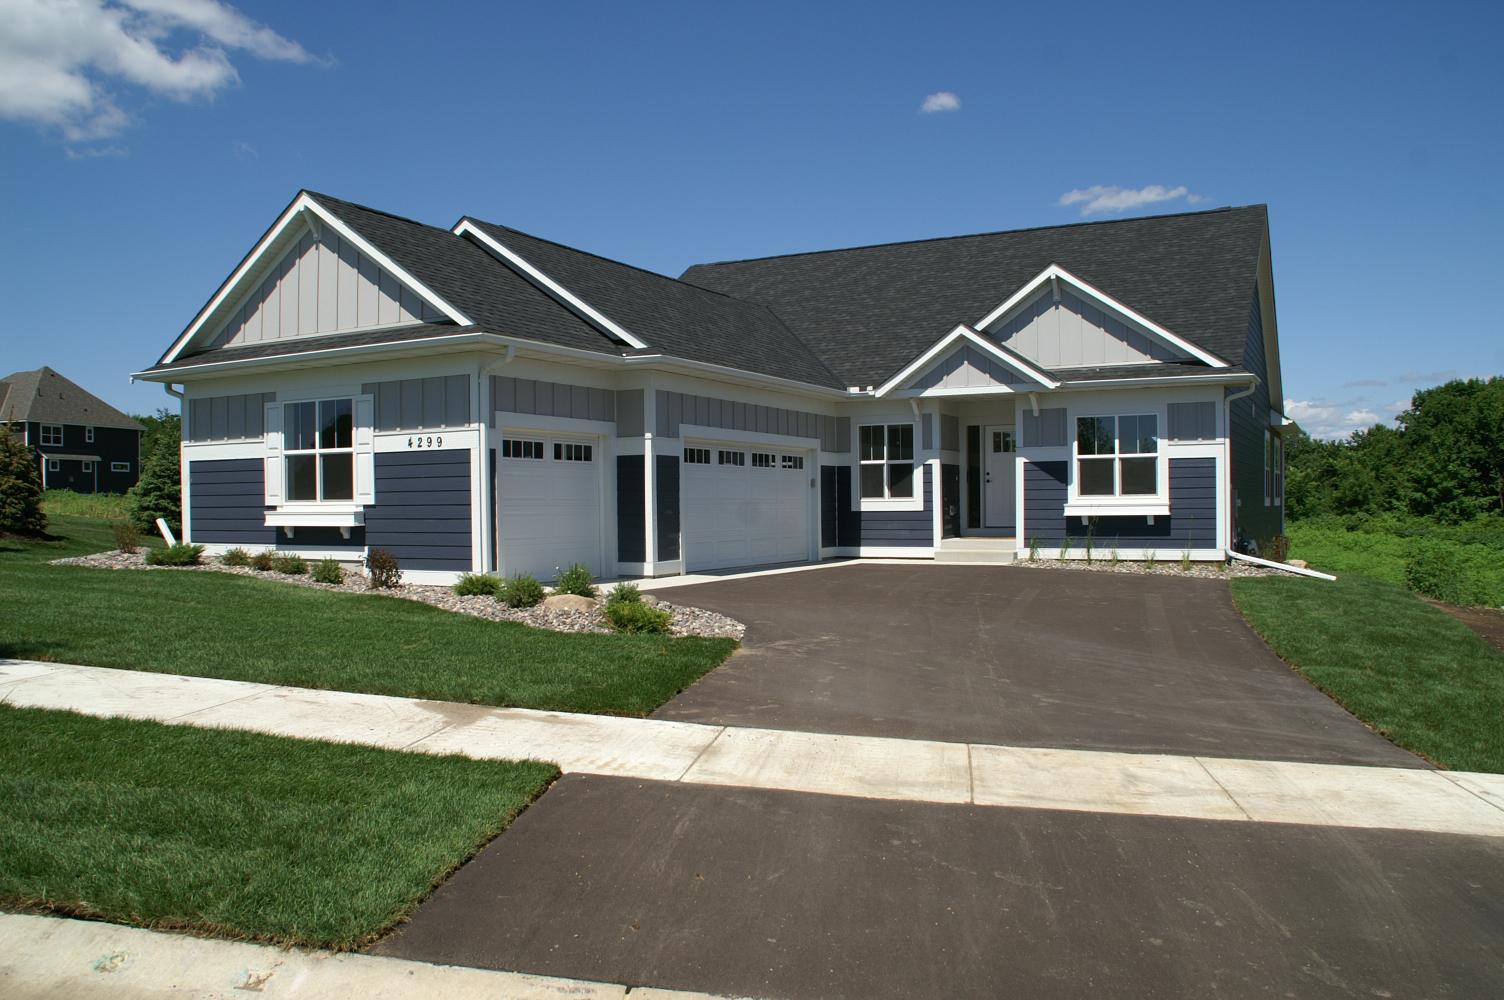 4299 Harrow Cove Property Photo - Chaska, MN real estate listing